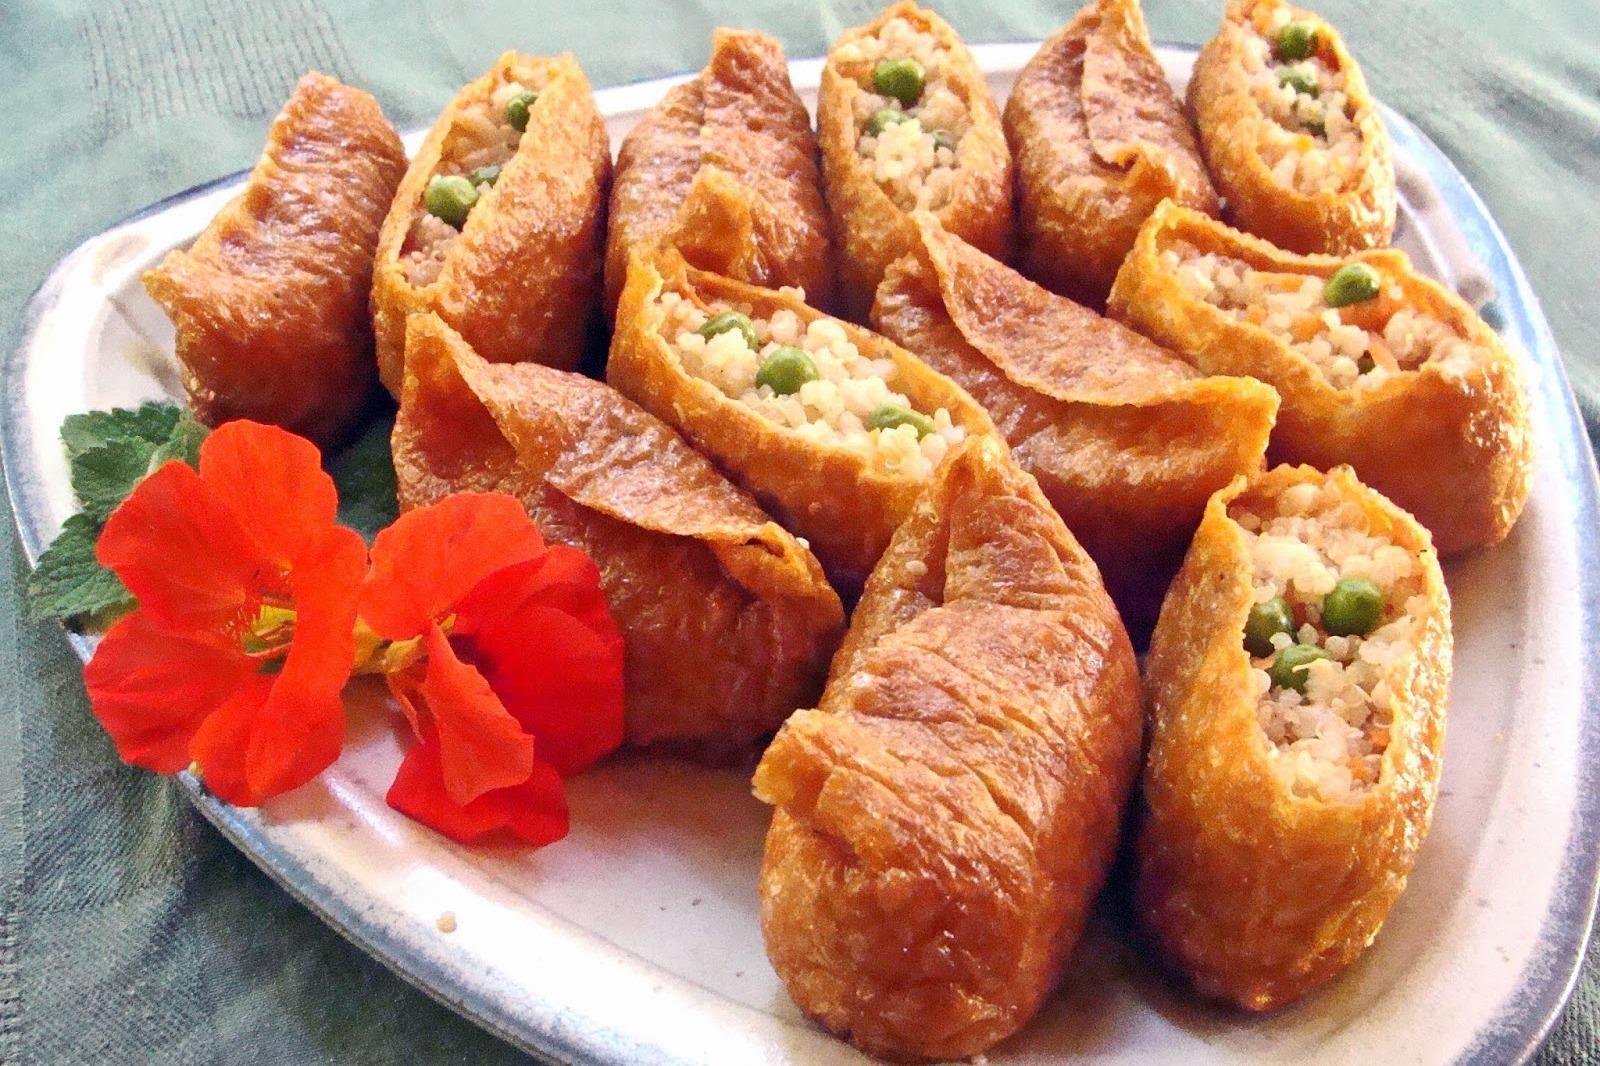 Multi-Whole-Grain Inari Sushi (Sushi Grains in Fried Tofu Pockets) [Vegan]